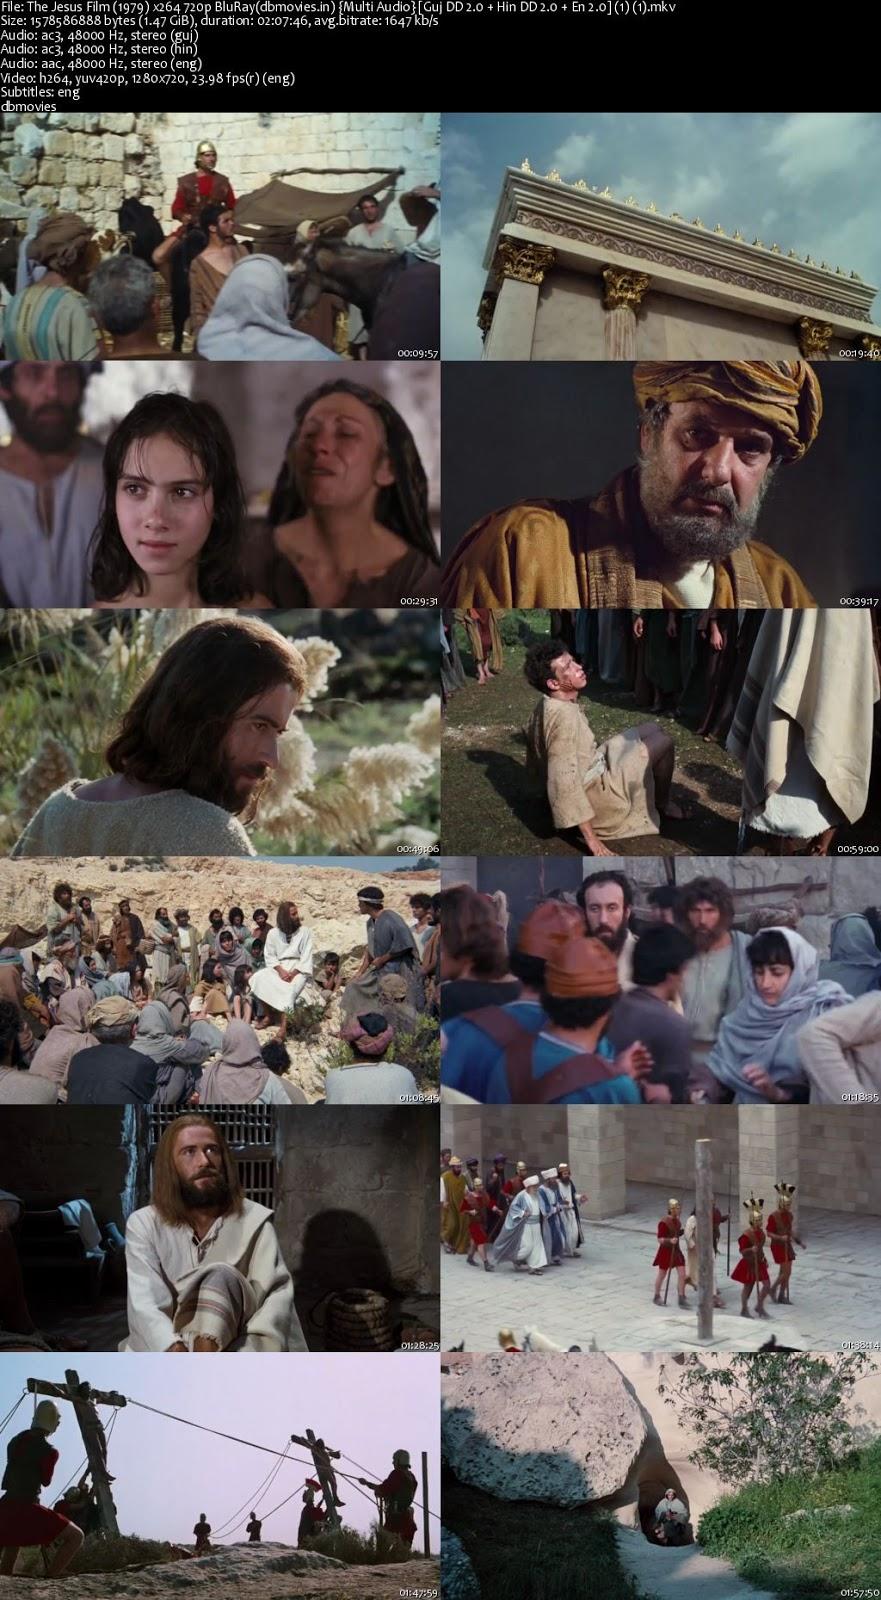 screen shot The Jesus Film 1979 Full HD Movie Download Hindi Free 720p